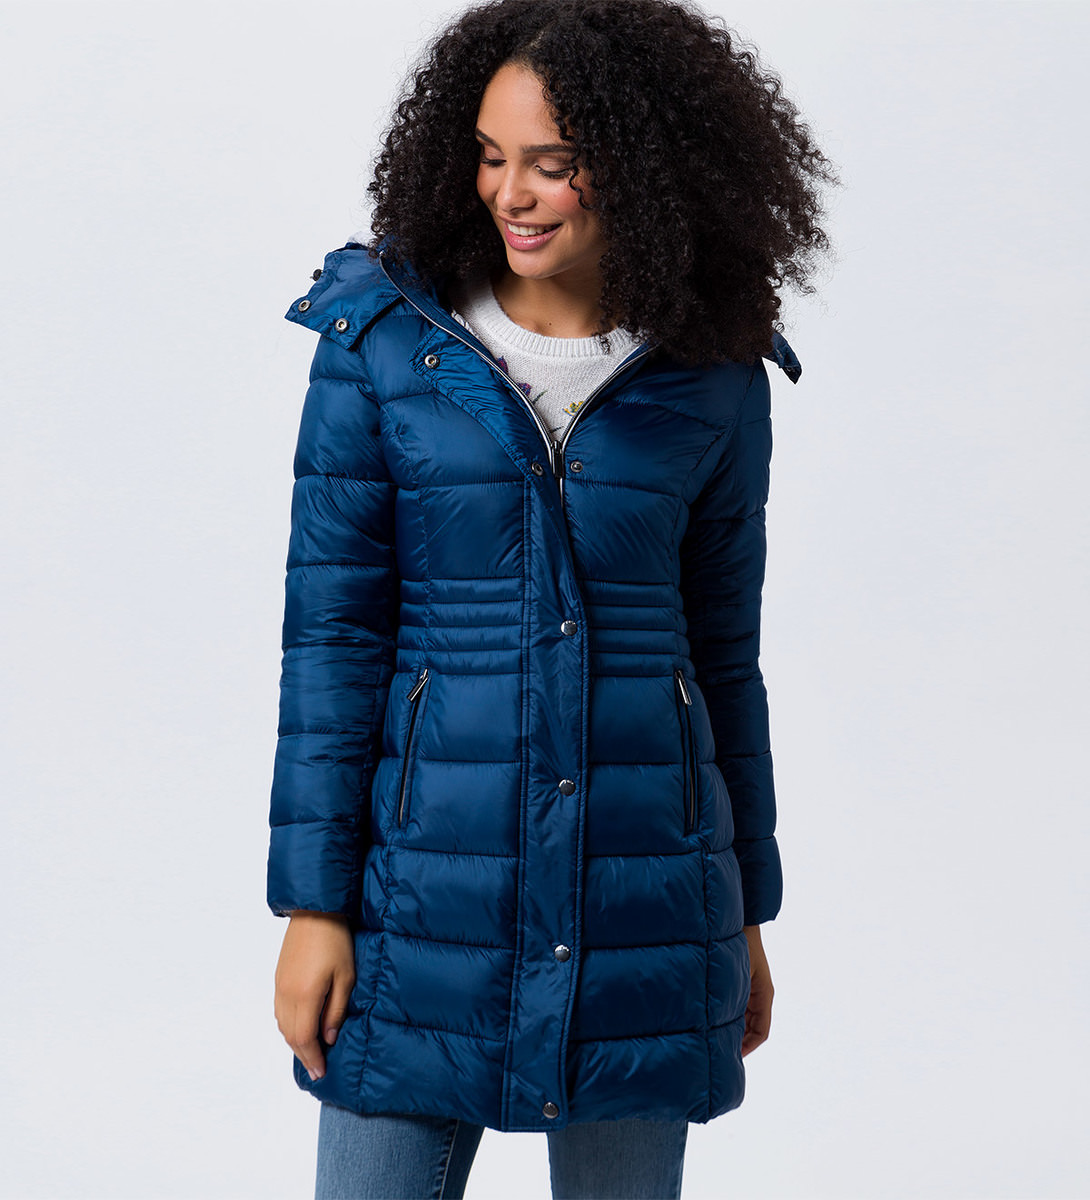 Jacke mit warmer Wattierung in petrol blue